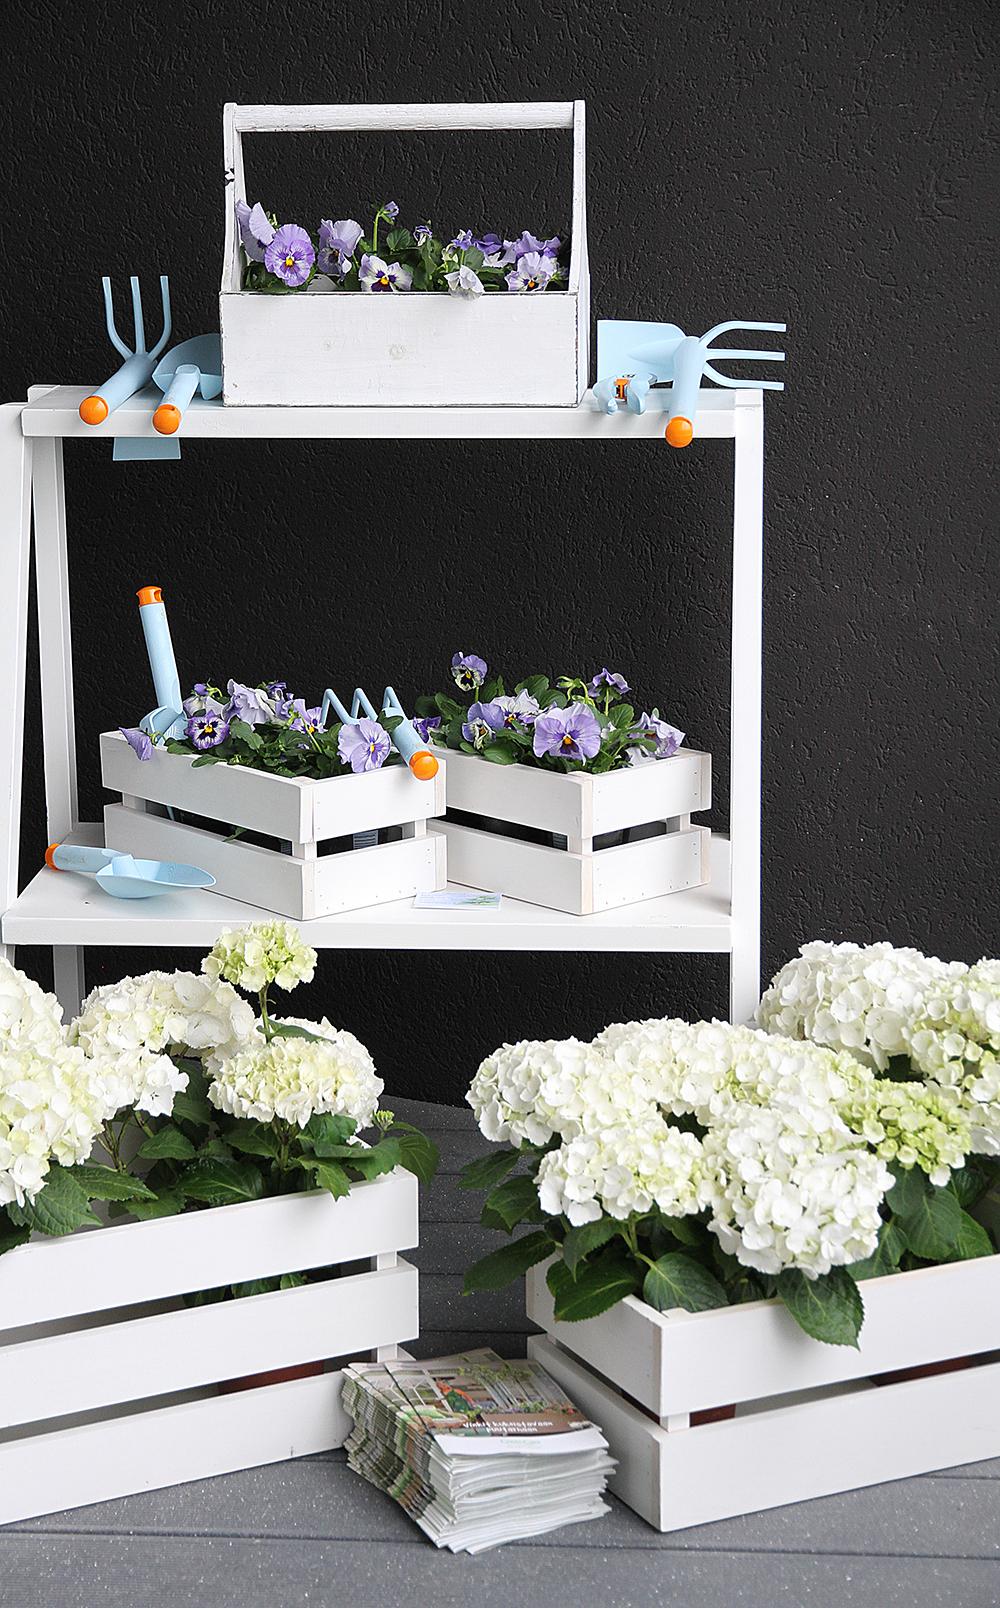 fiskars uutuus 2014 kevat hunajaista sisustusblogi parveke hortensia stailaus